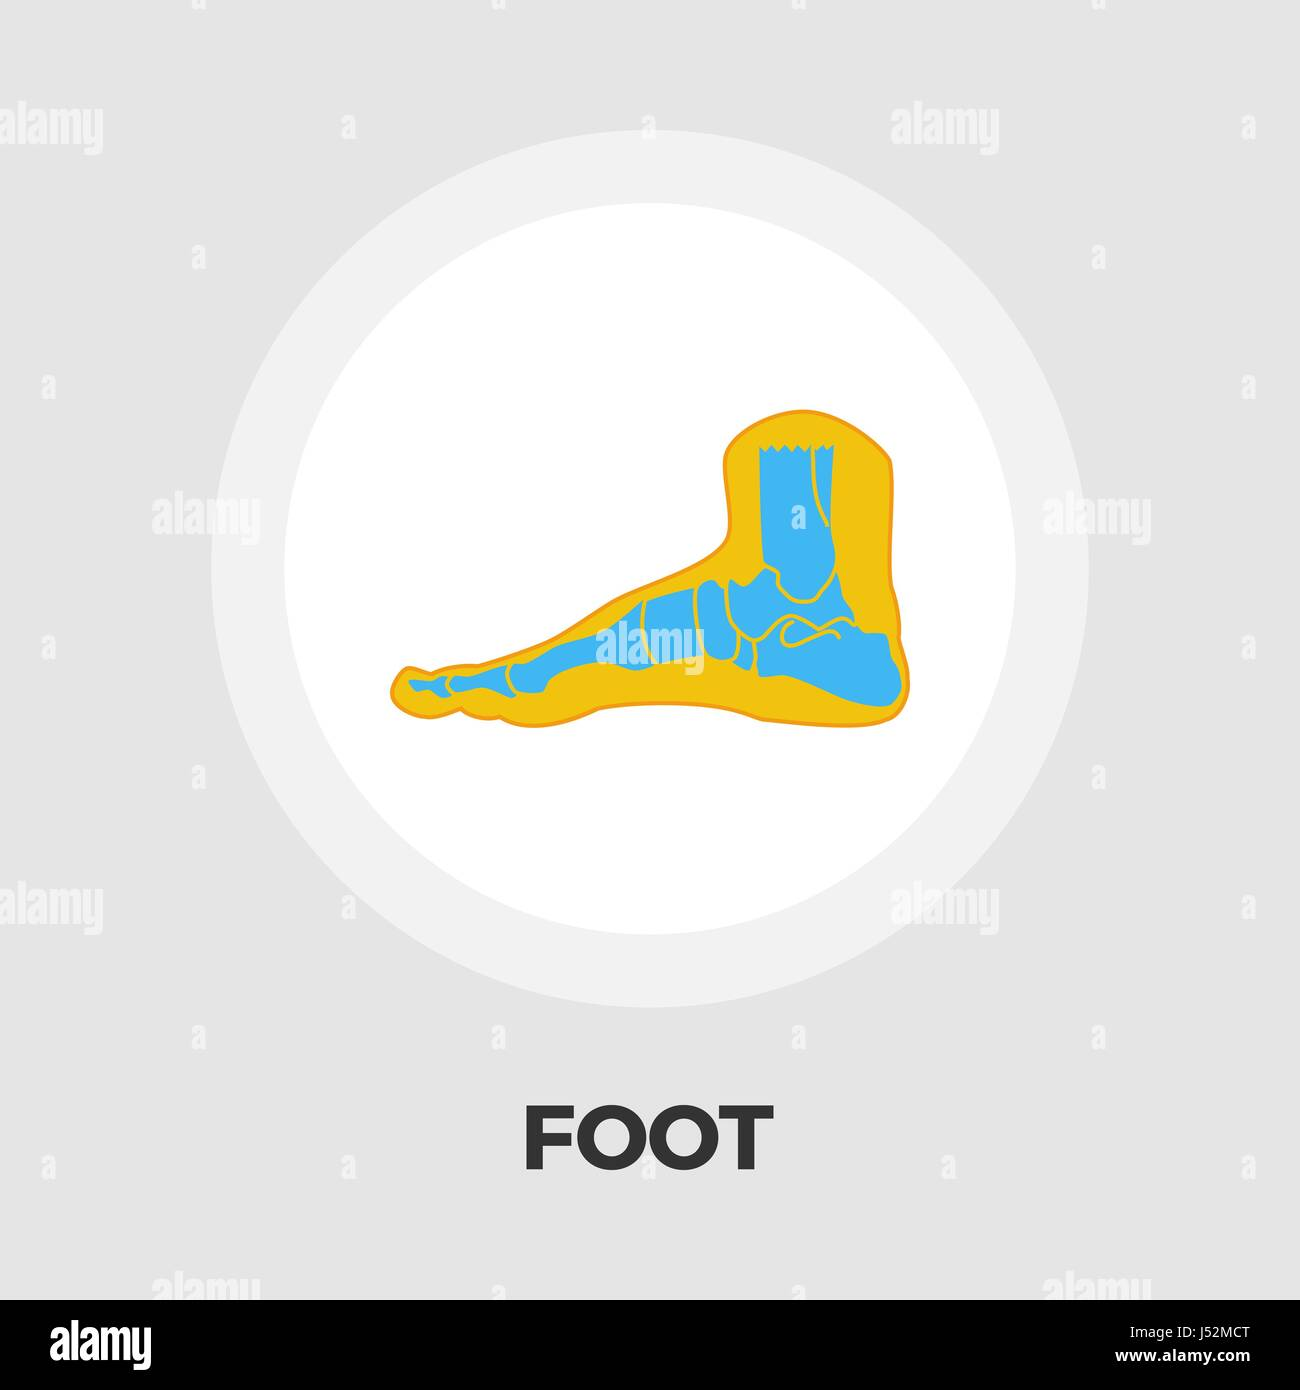 Ankle Scan Stockfotos & Ankle Scan Bilder - Seite 2 - Alamy